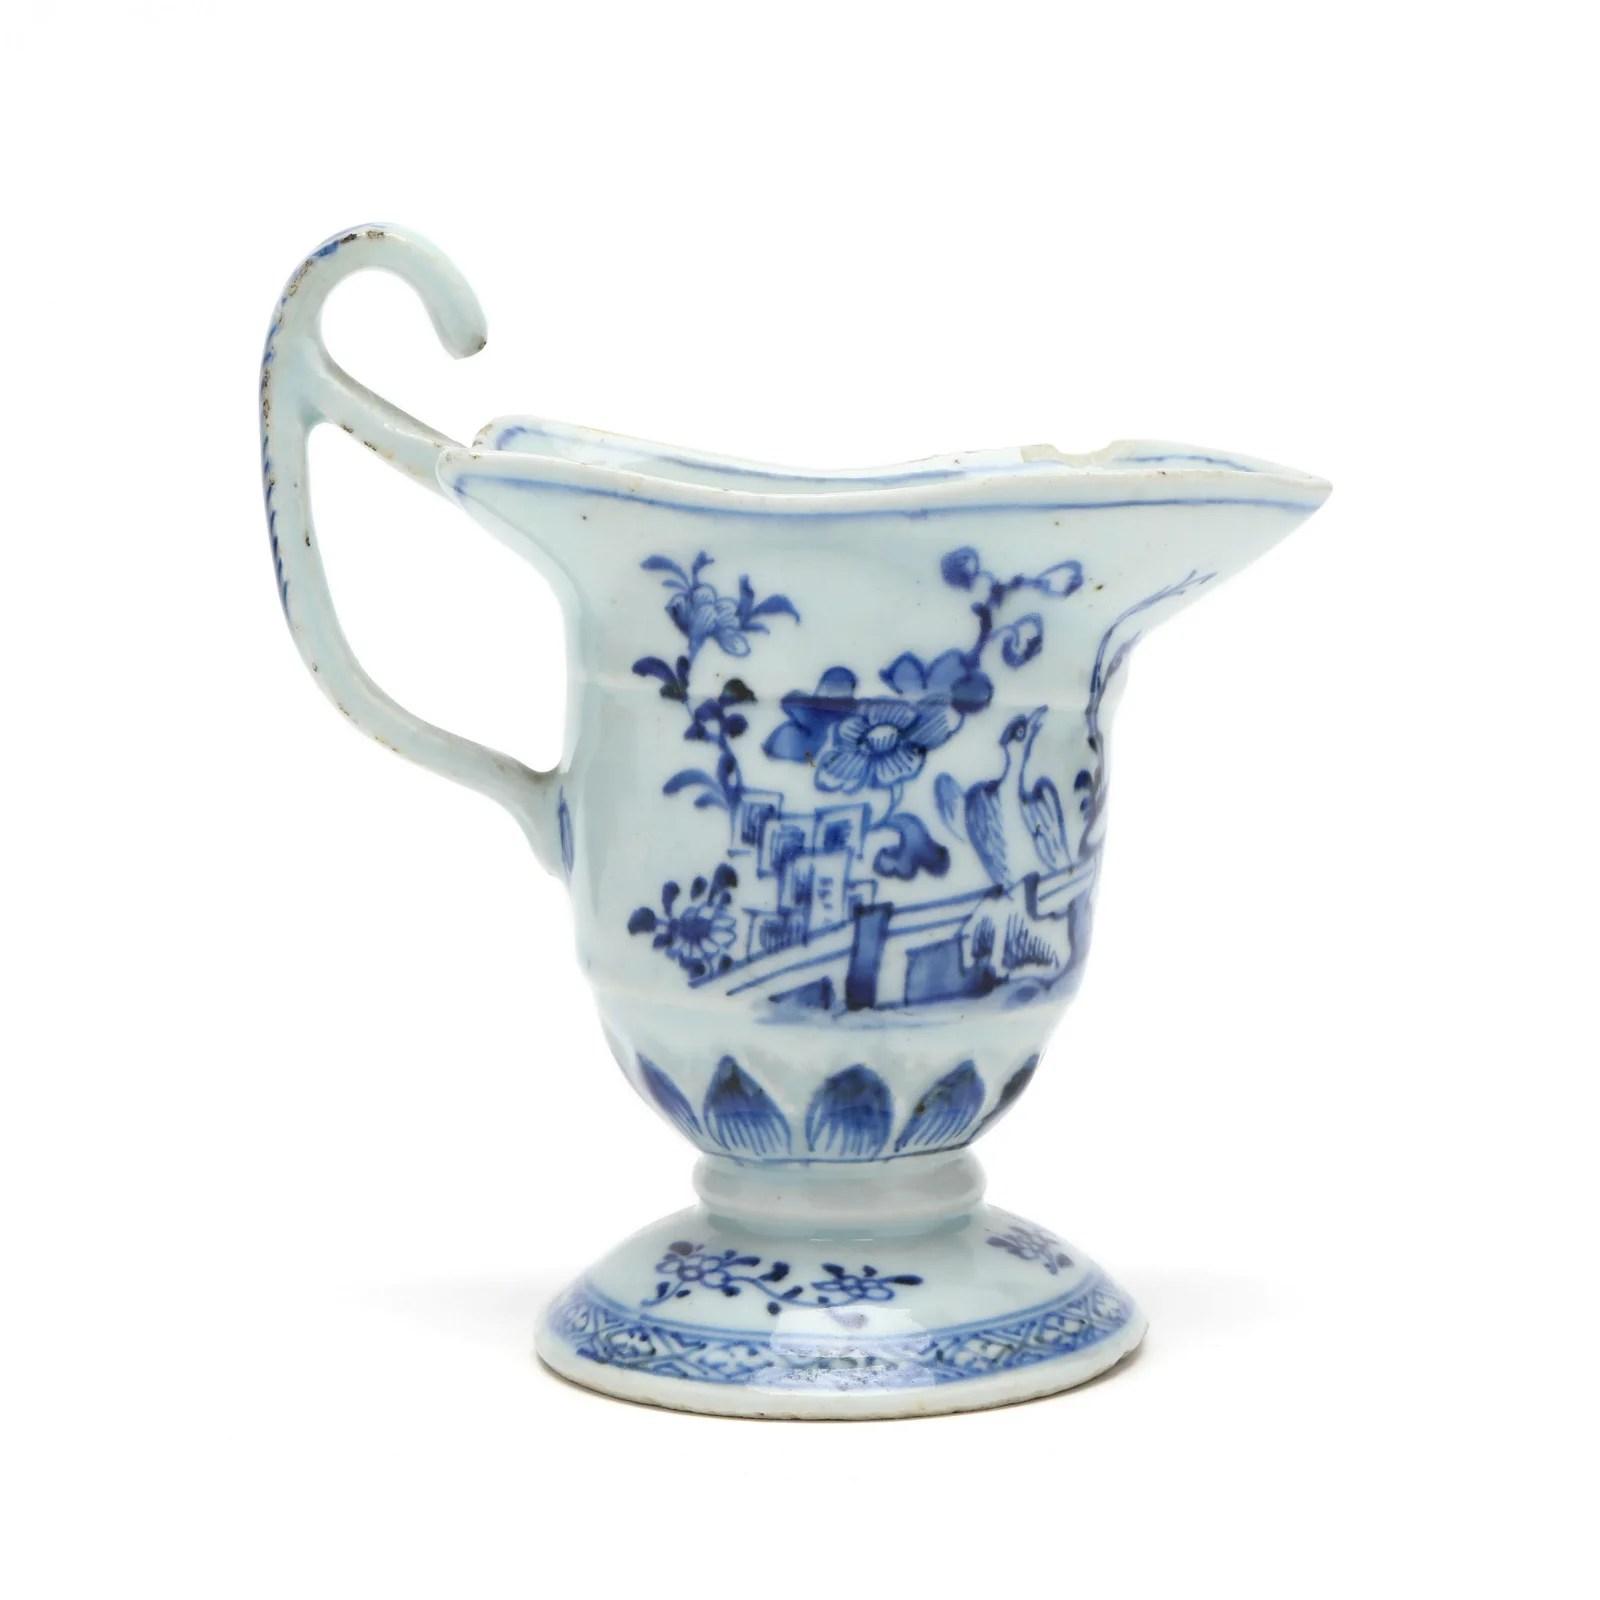 A Chinese Export Porcelain Helmet Form Creamer